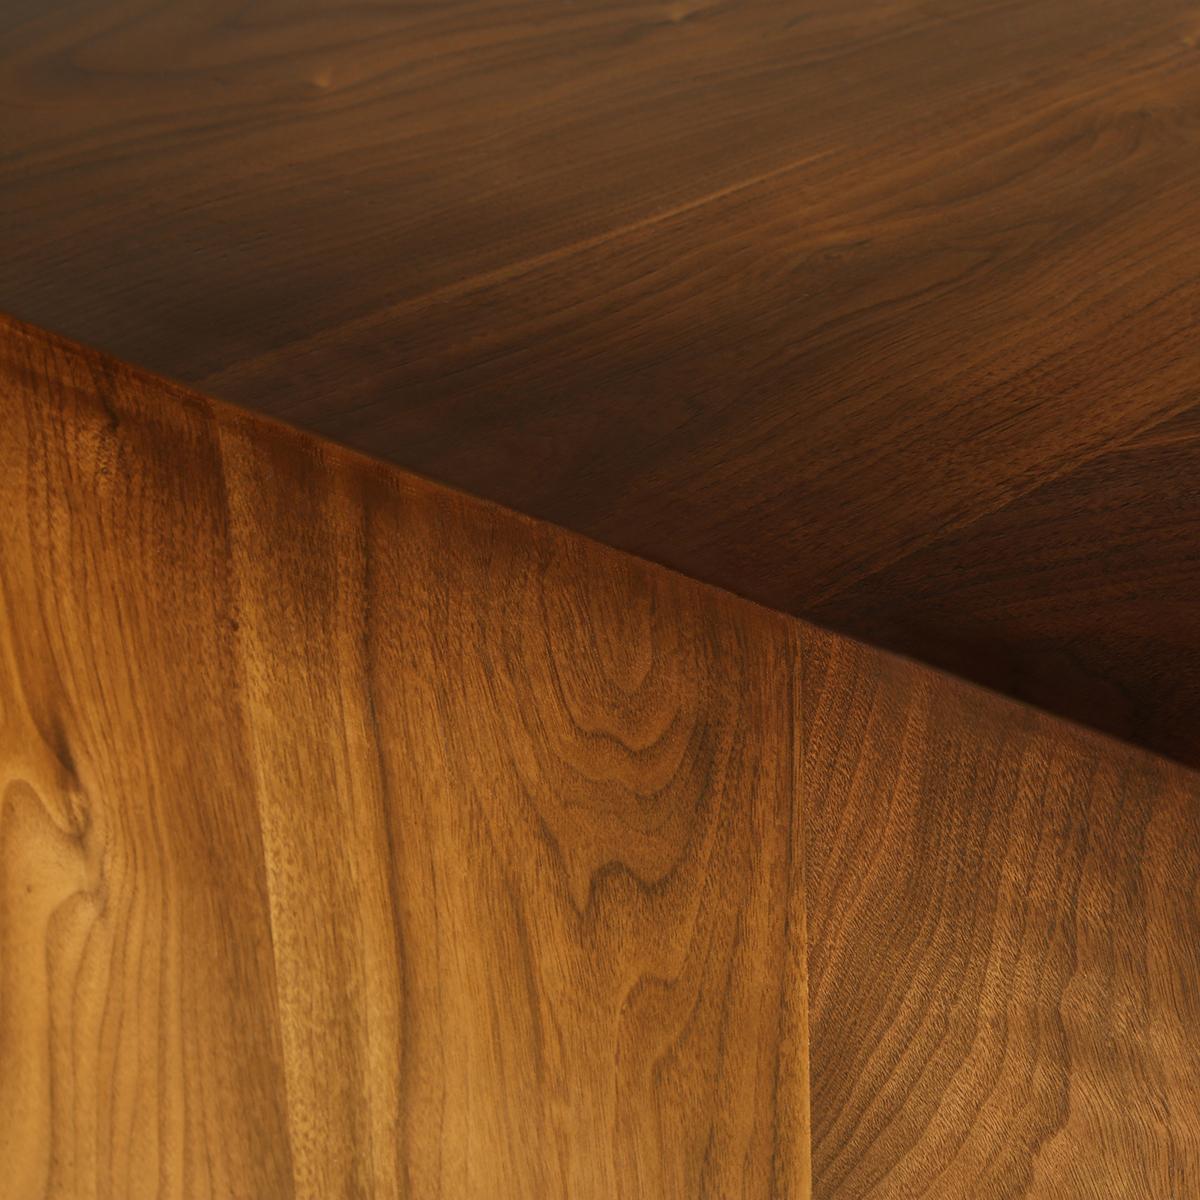 Vero Coffee Table Closeup 1X